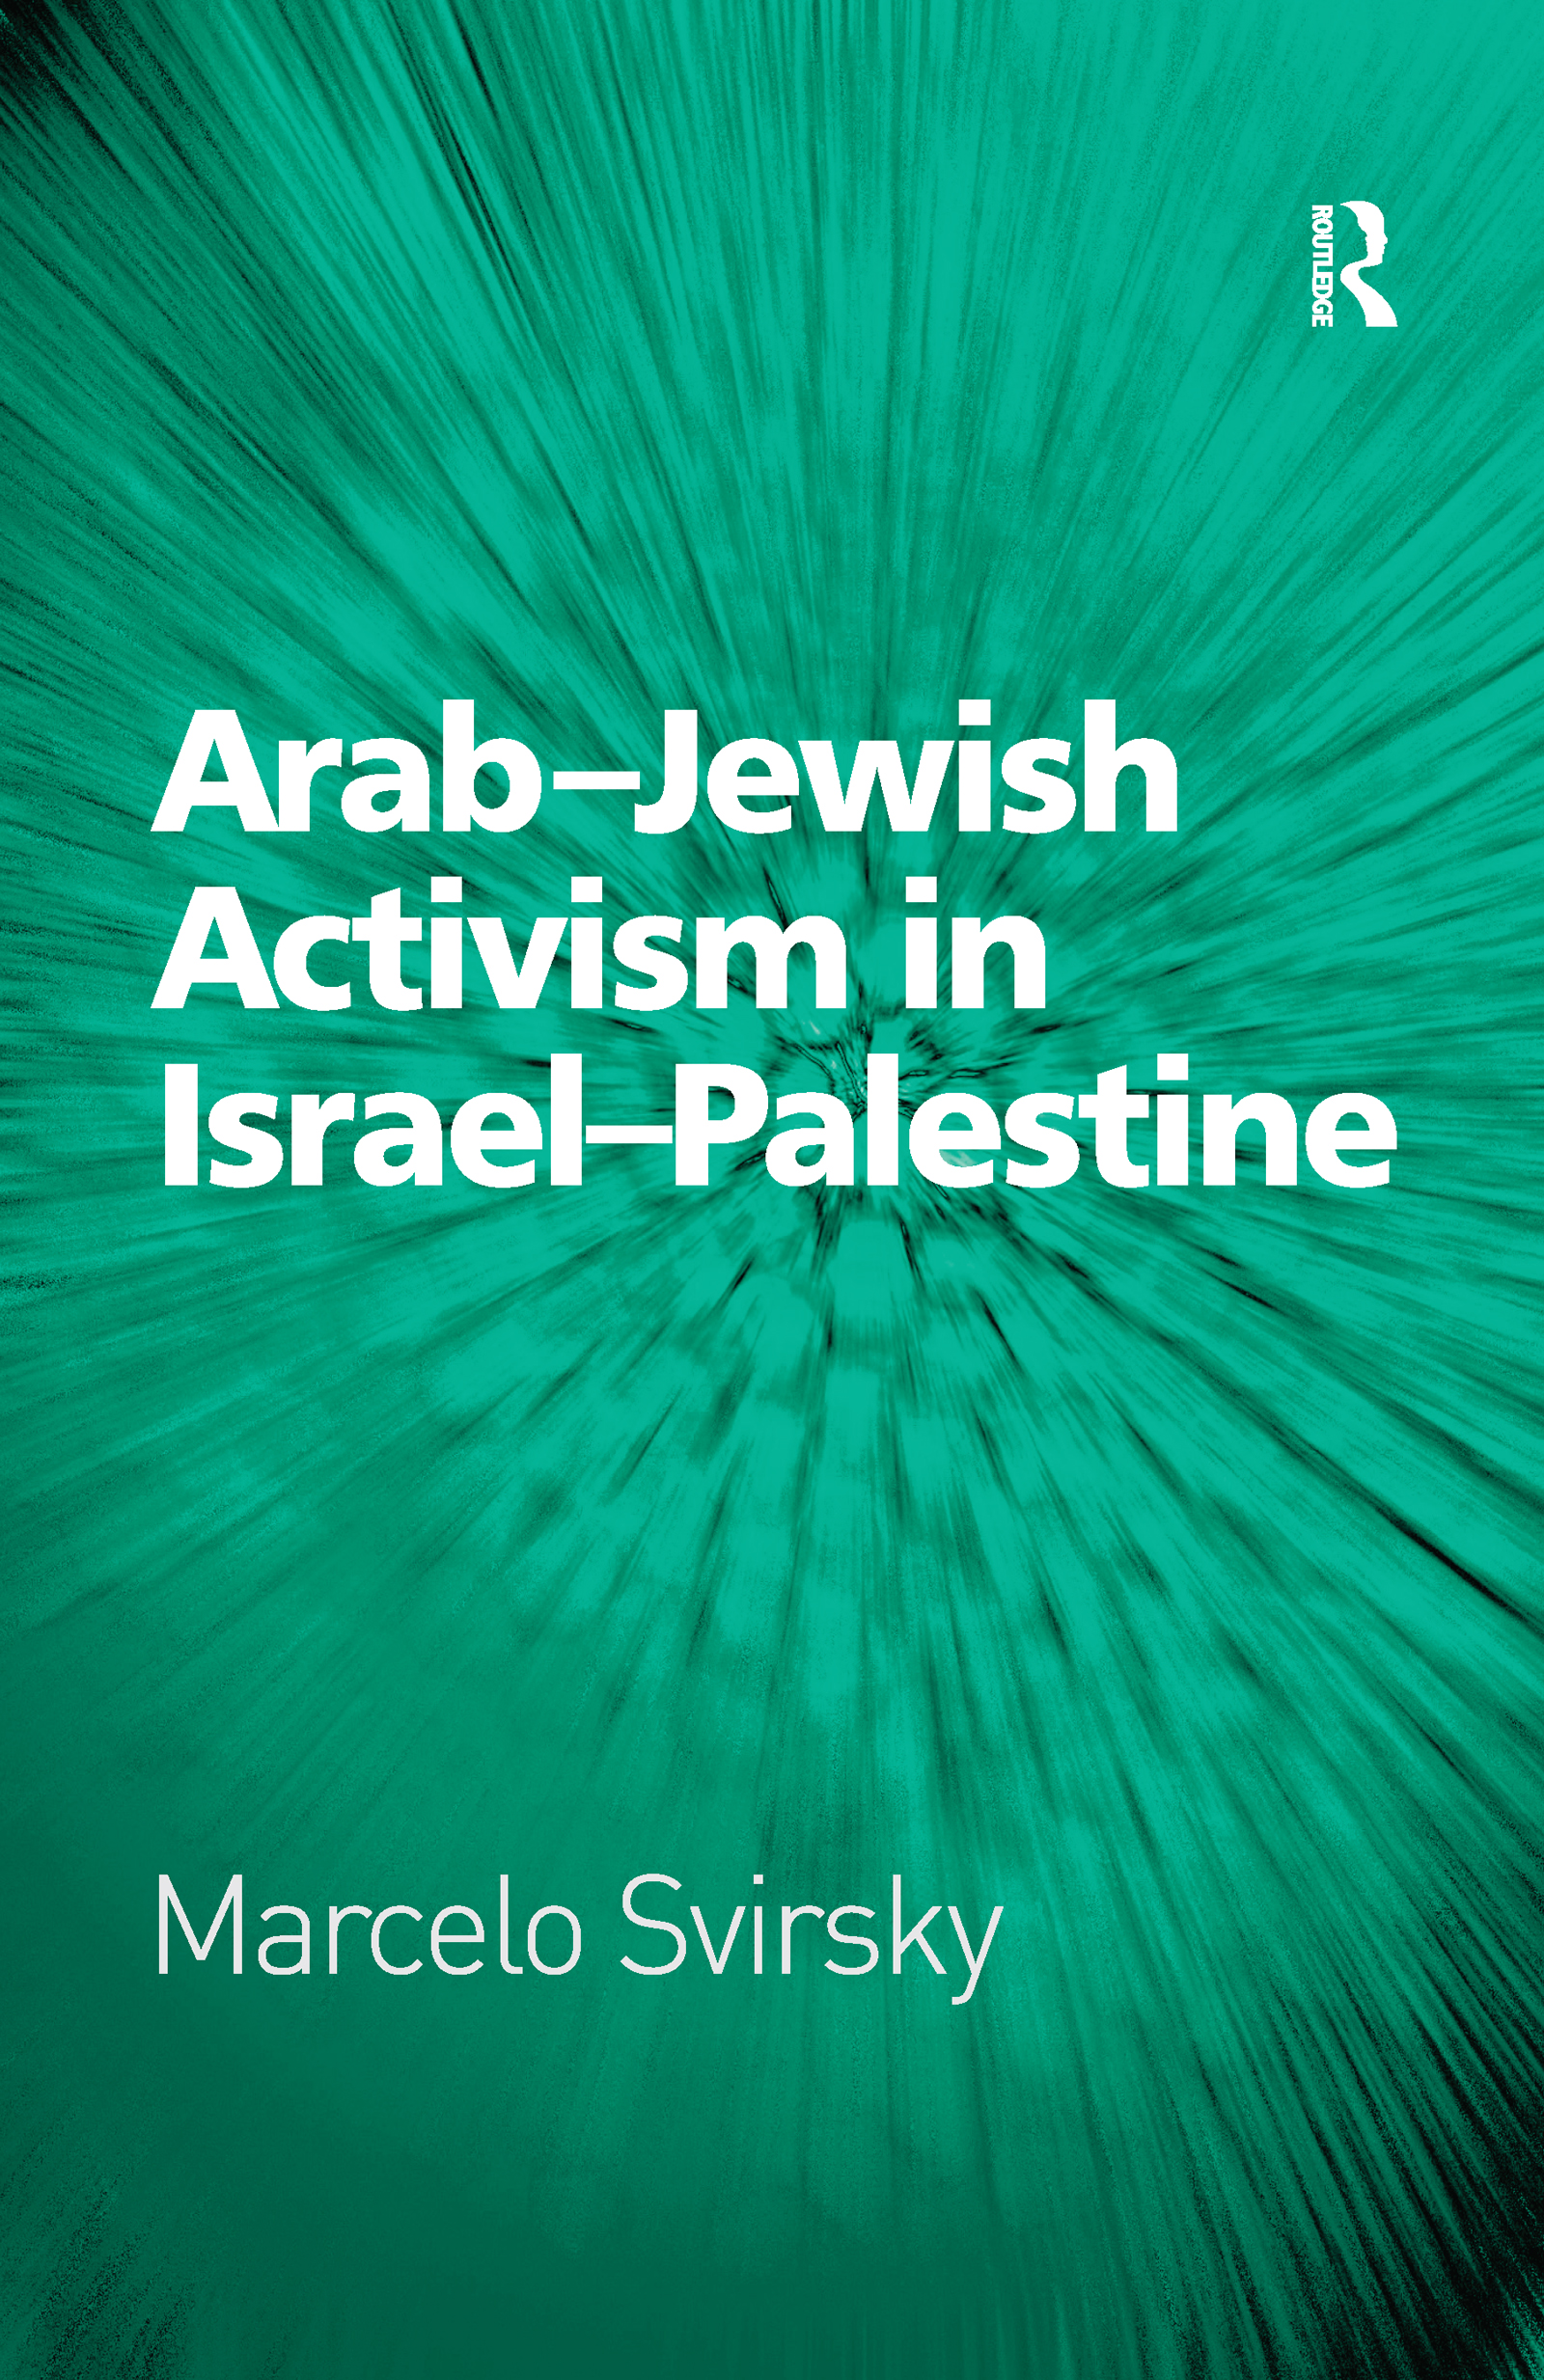 Arab-Jewish Activism in Israel-Palestine